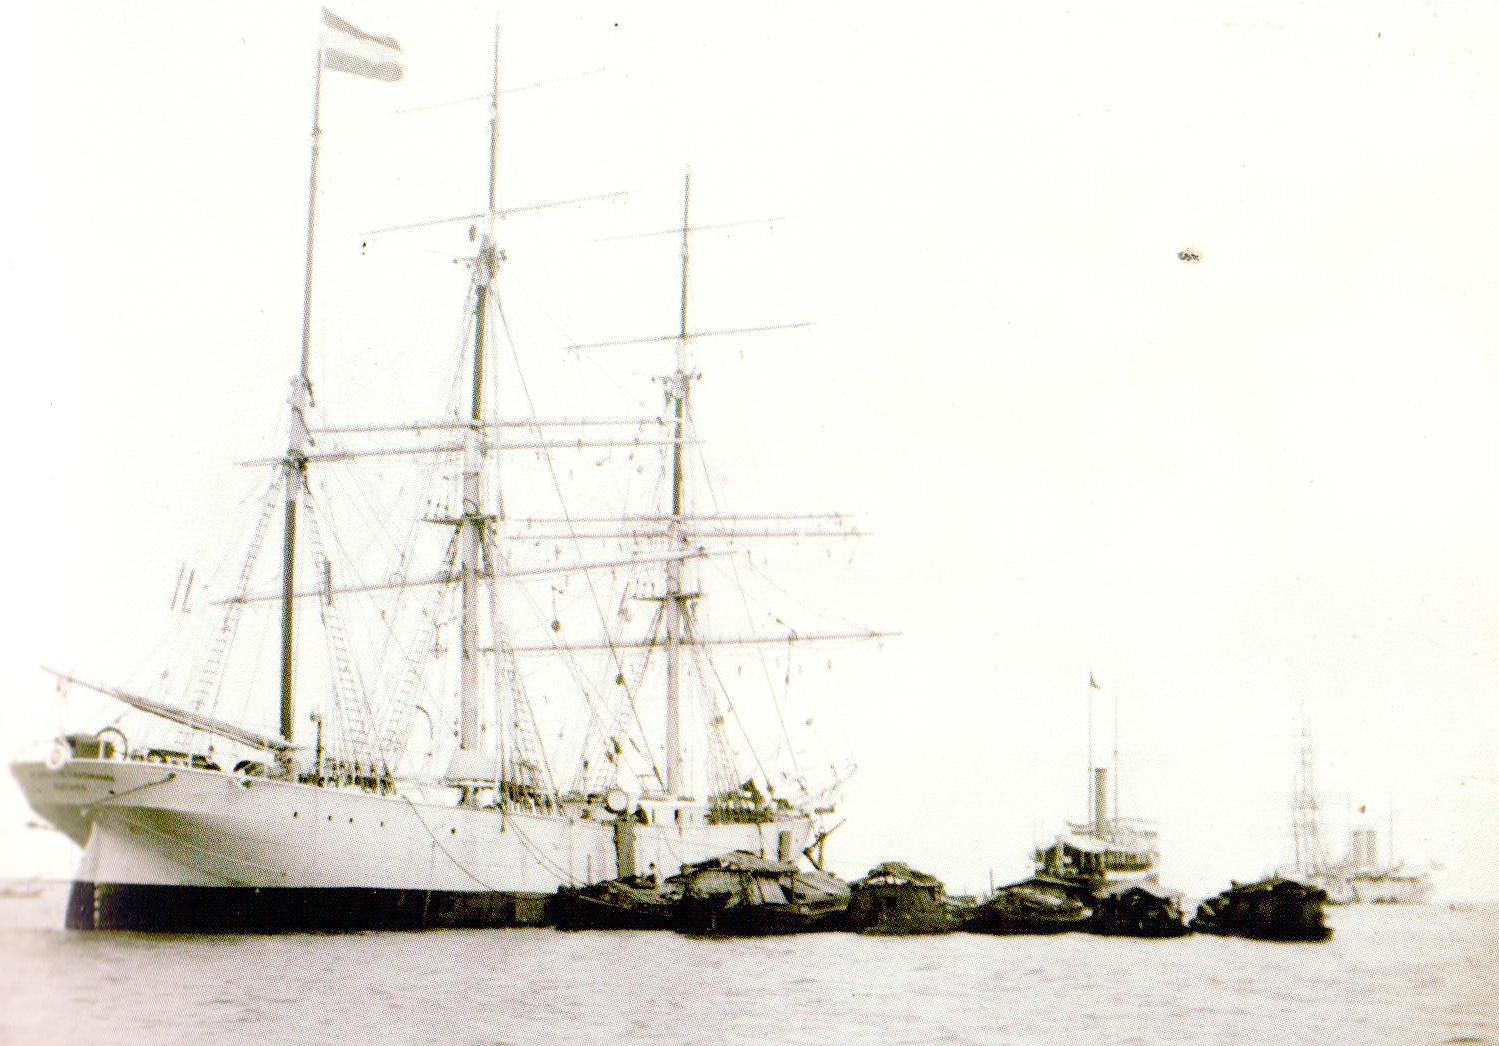 Ship: Henriette Haasmann loading the Batavia Arrack